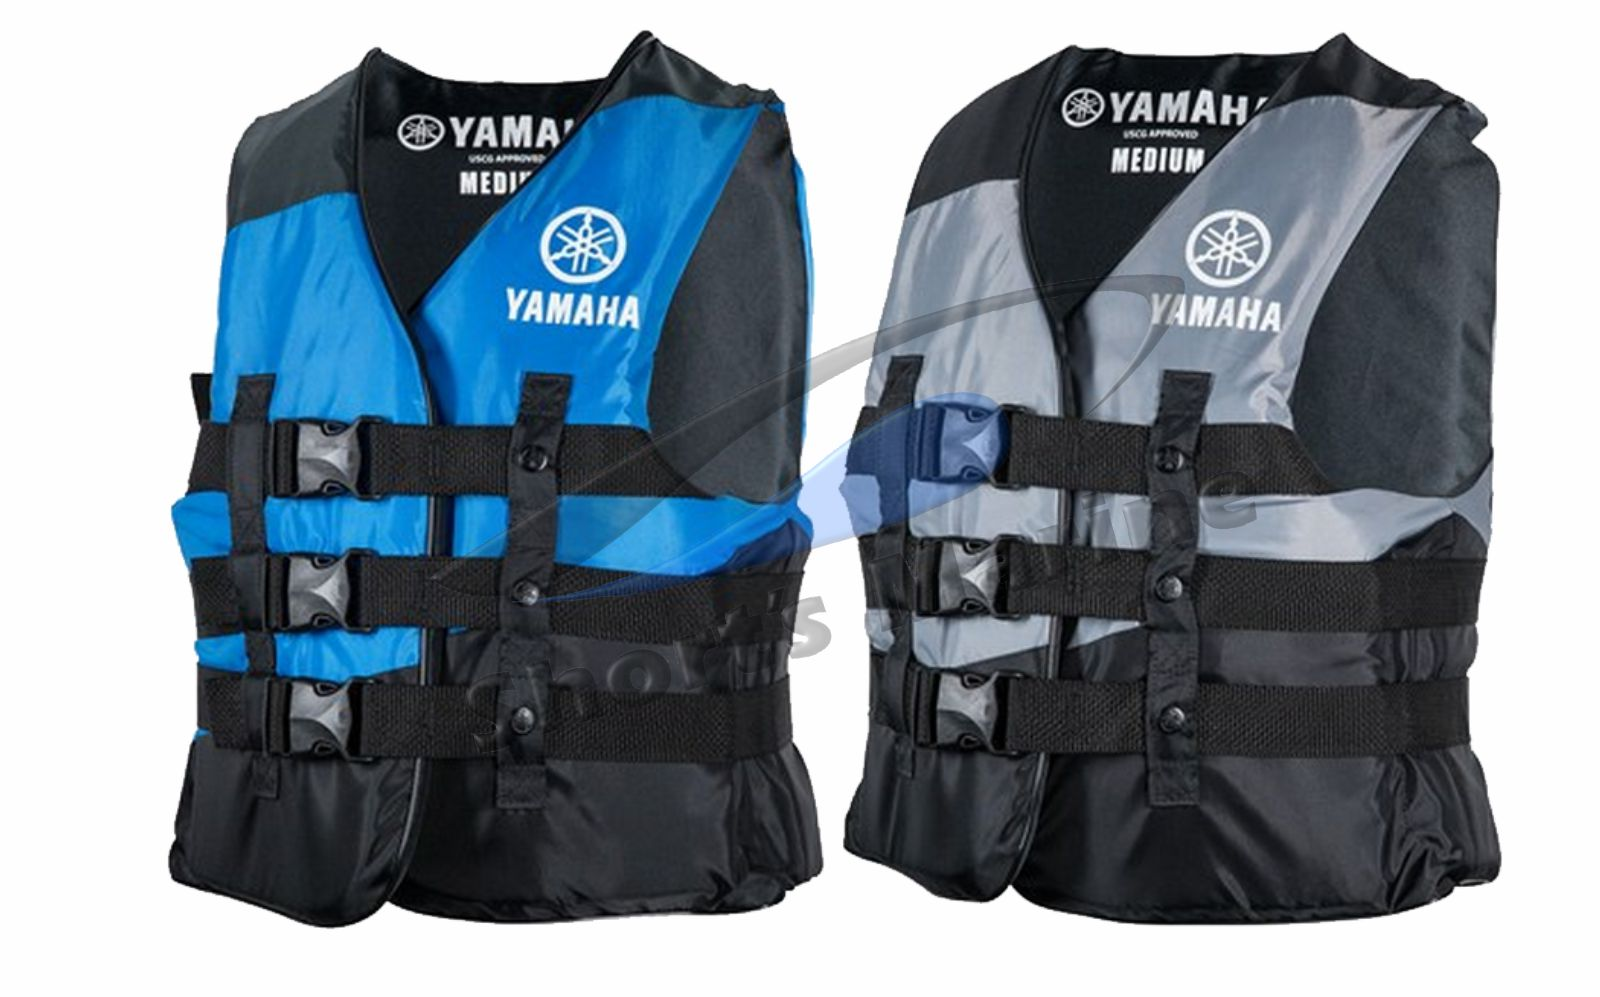 Oem Men S Yamaha Value Nylon 3 Buckle Pfd Life Jacket Vest Ebay